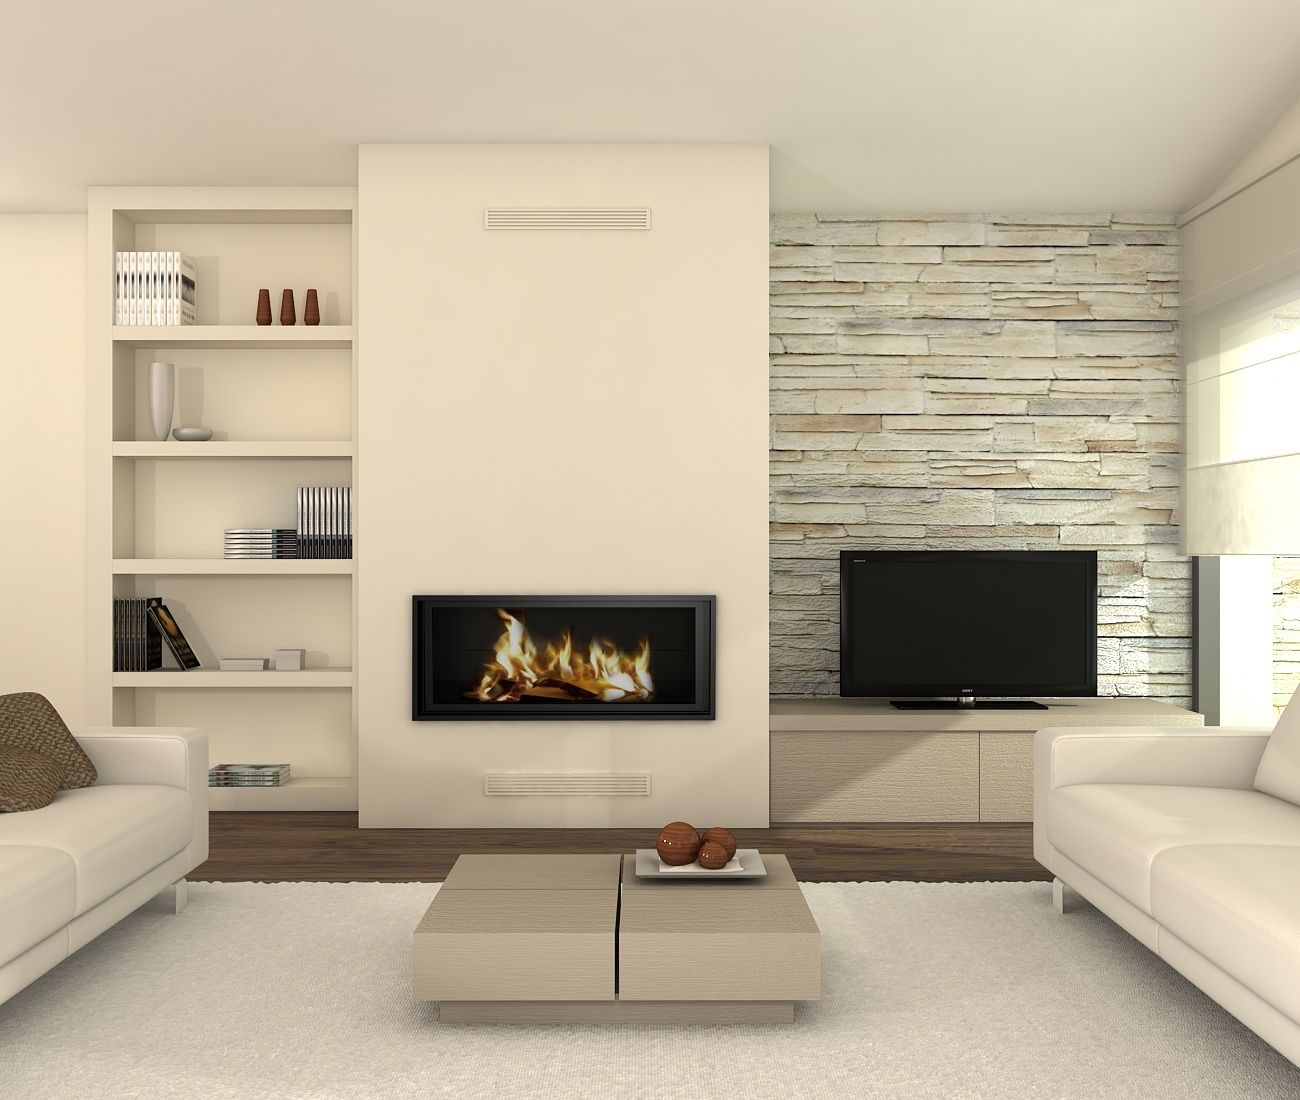 Salón con chimenea,moderno y precioso... | Fires | Pinterest ...